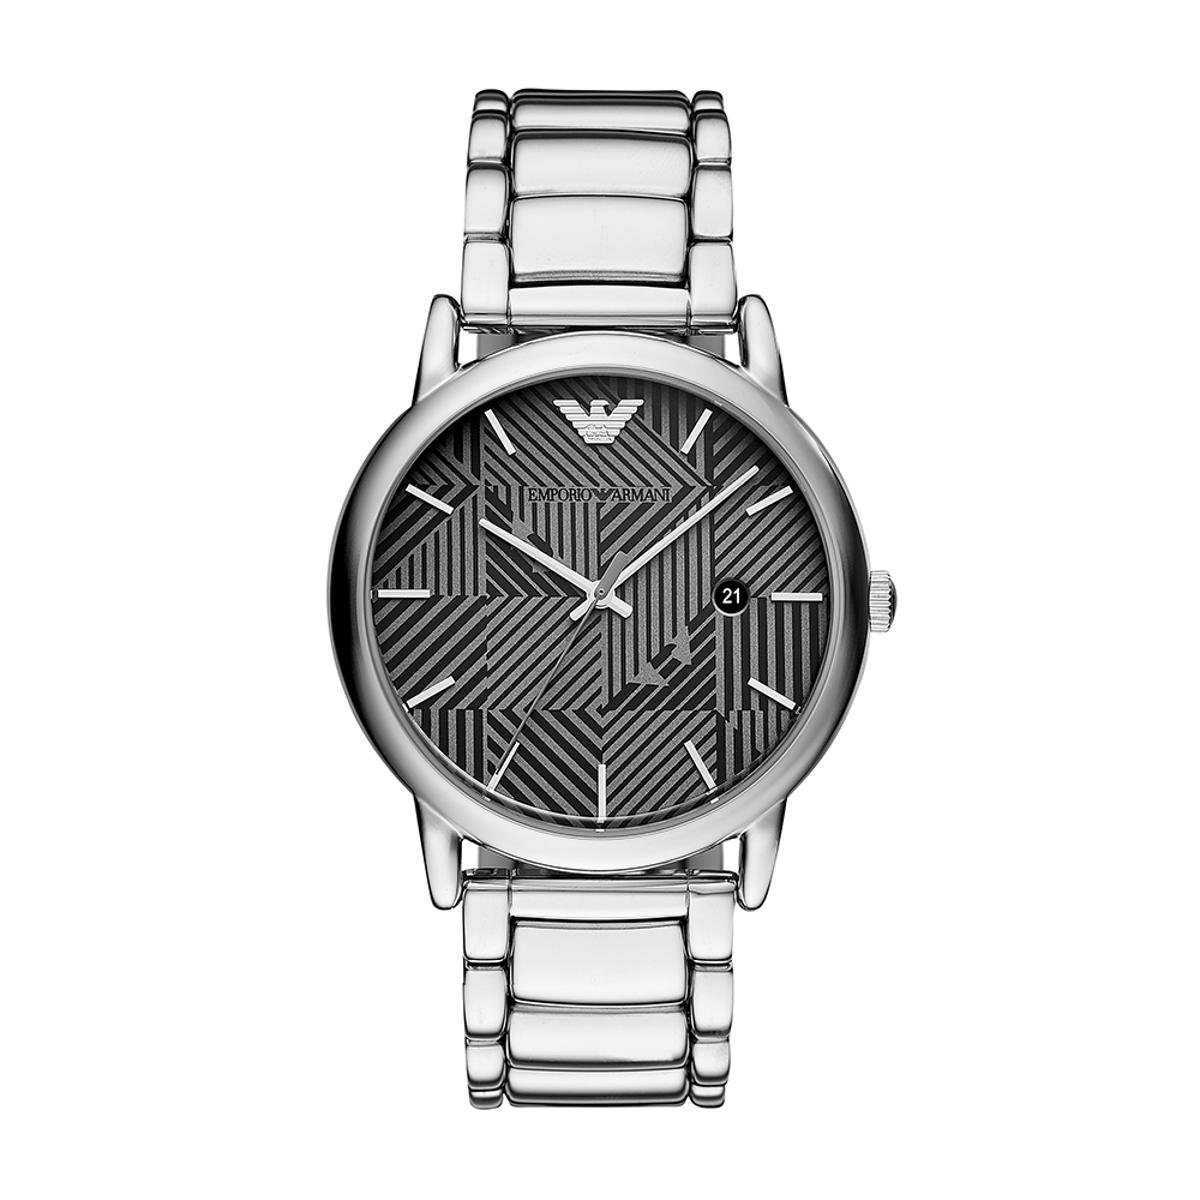 275c3c7746d Relógio Empório Armani Masculino Luigi - AR11134 1KN AR11134 1KN - Prata - Compre  Agora